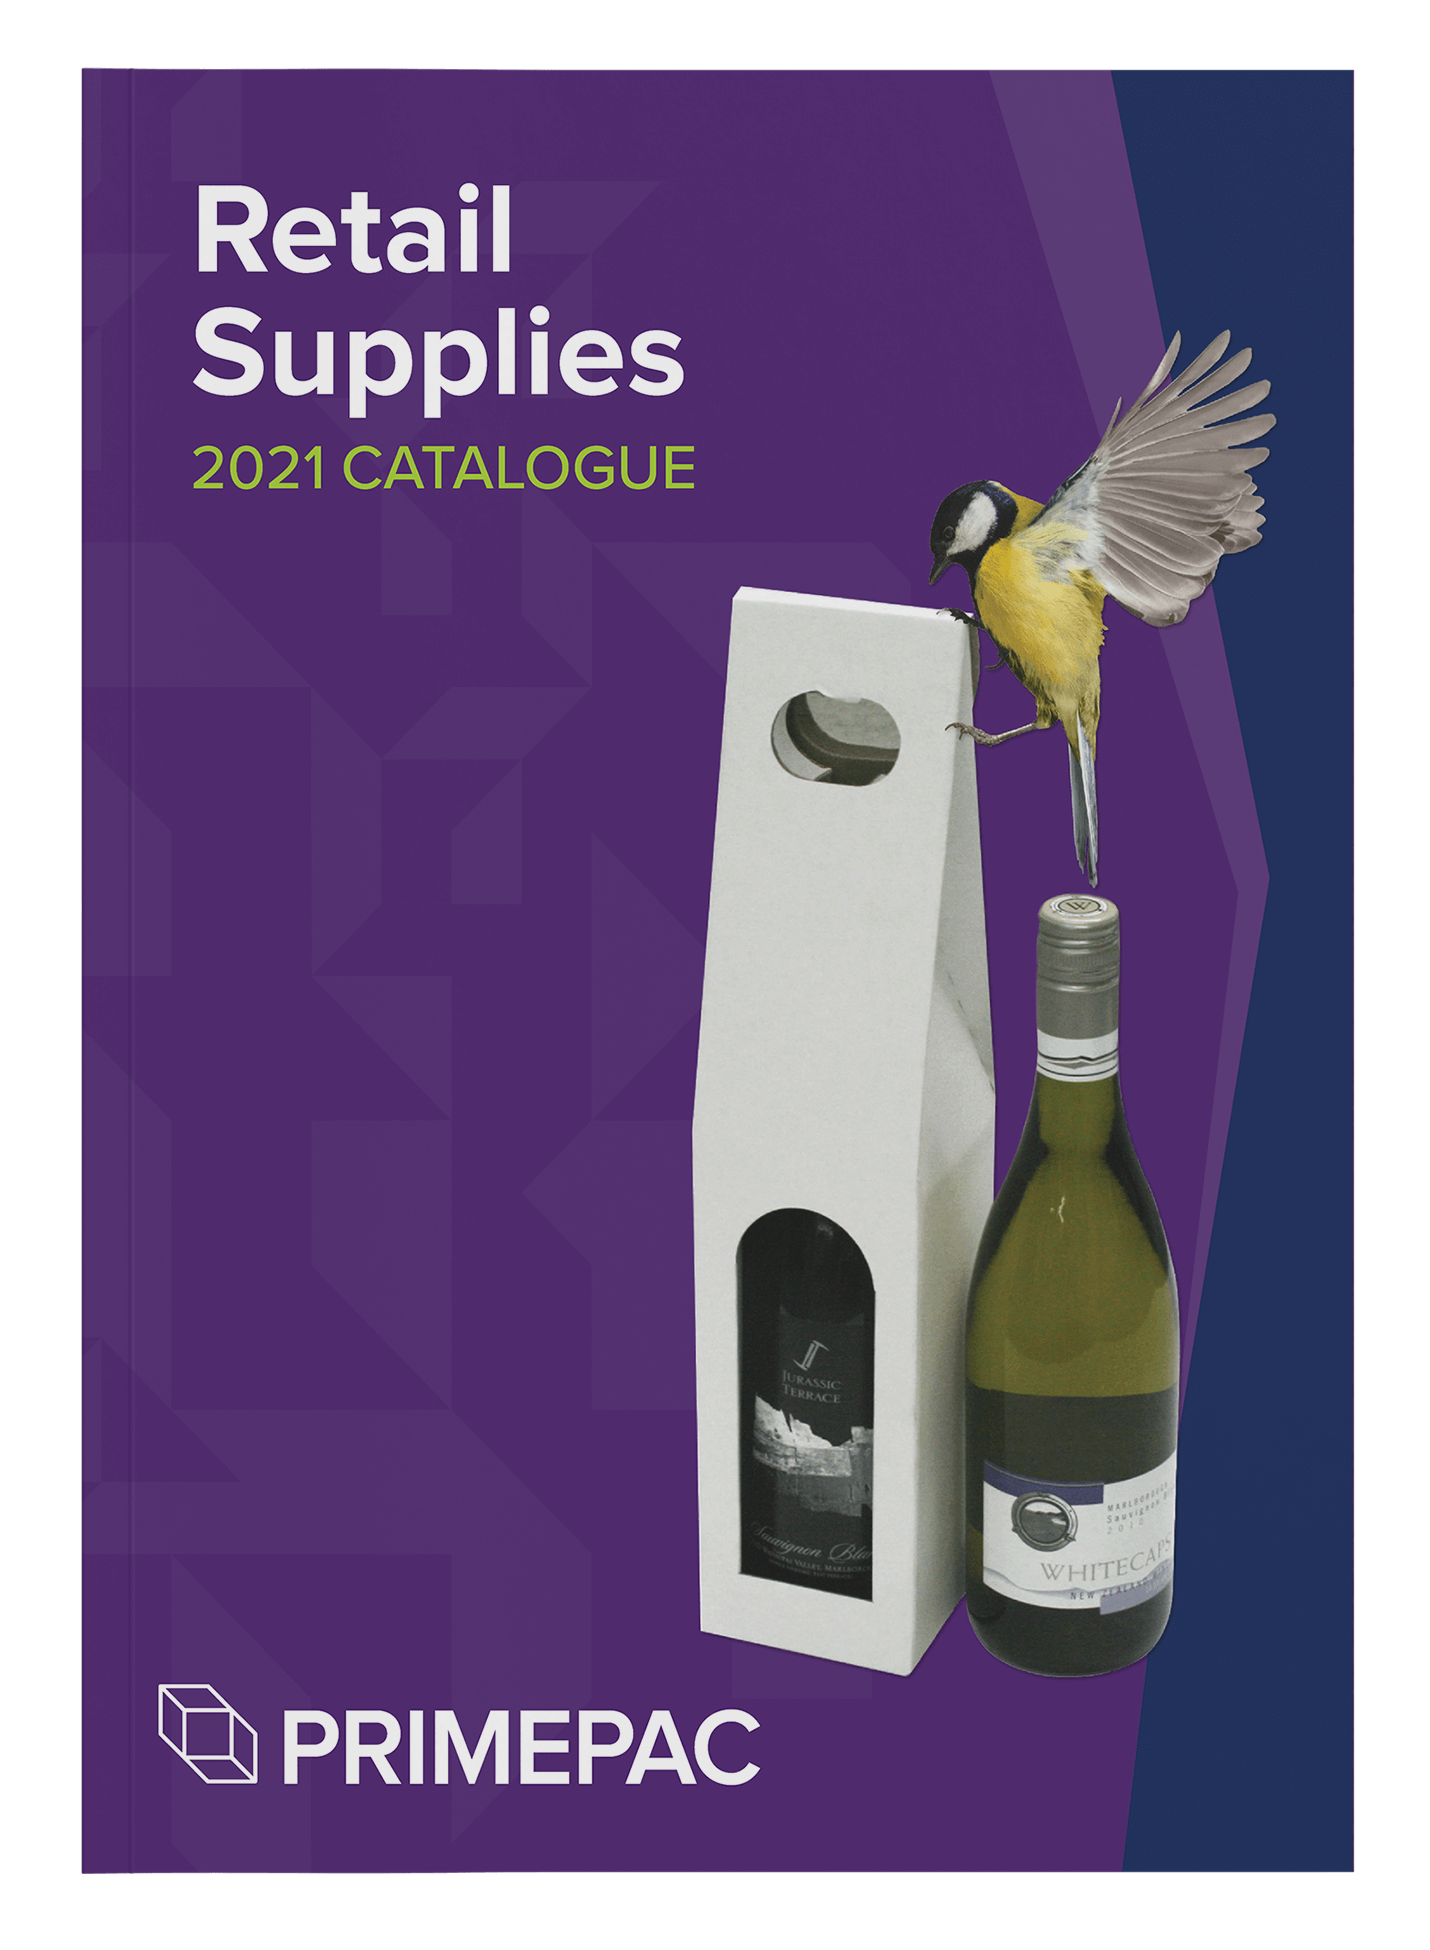 Retail supplies catalogue